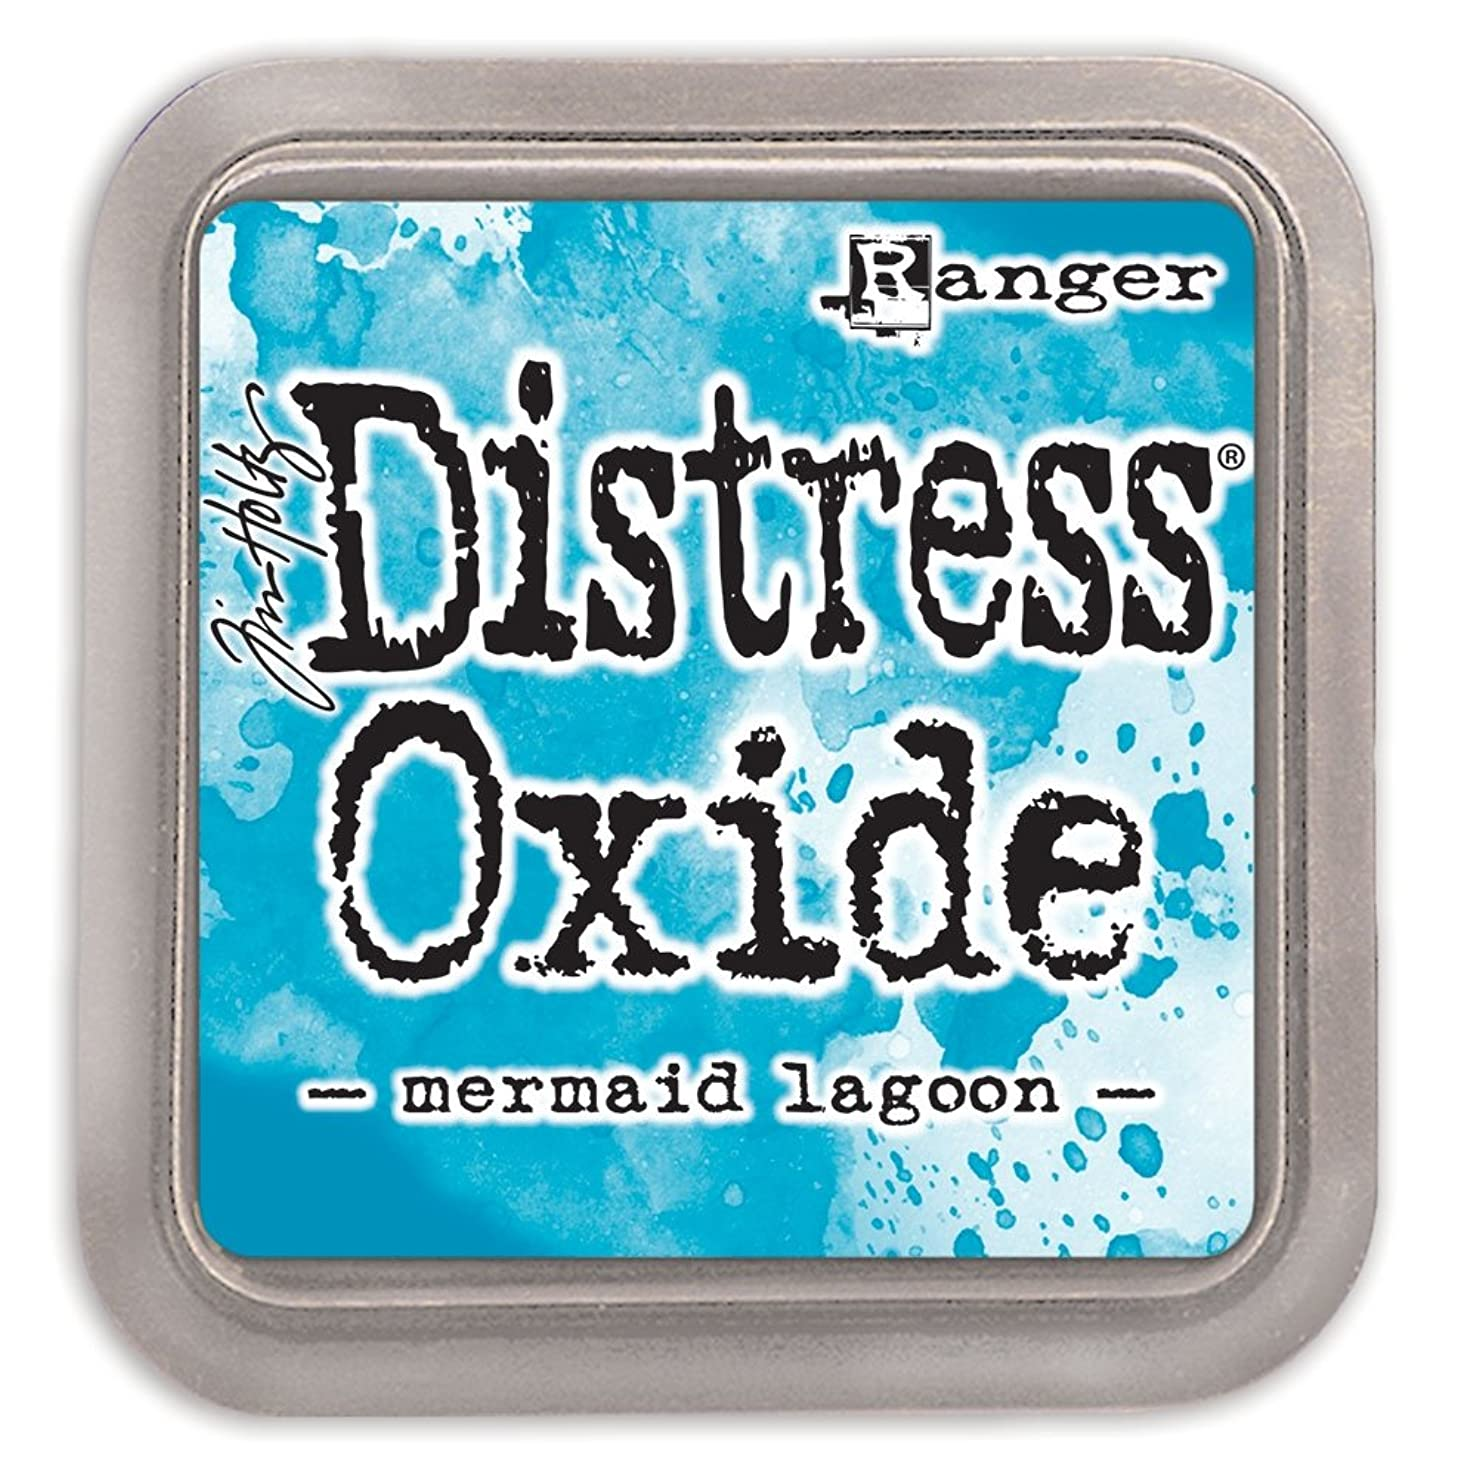 Ranger Tim Holtz Distress Oxide Ink Pad - Mermaid Lagoon